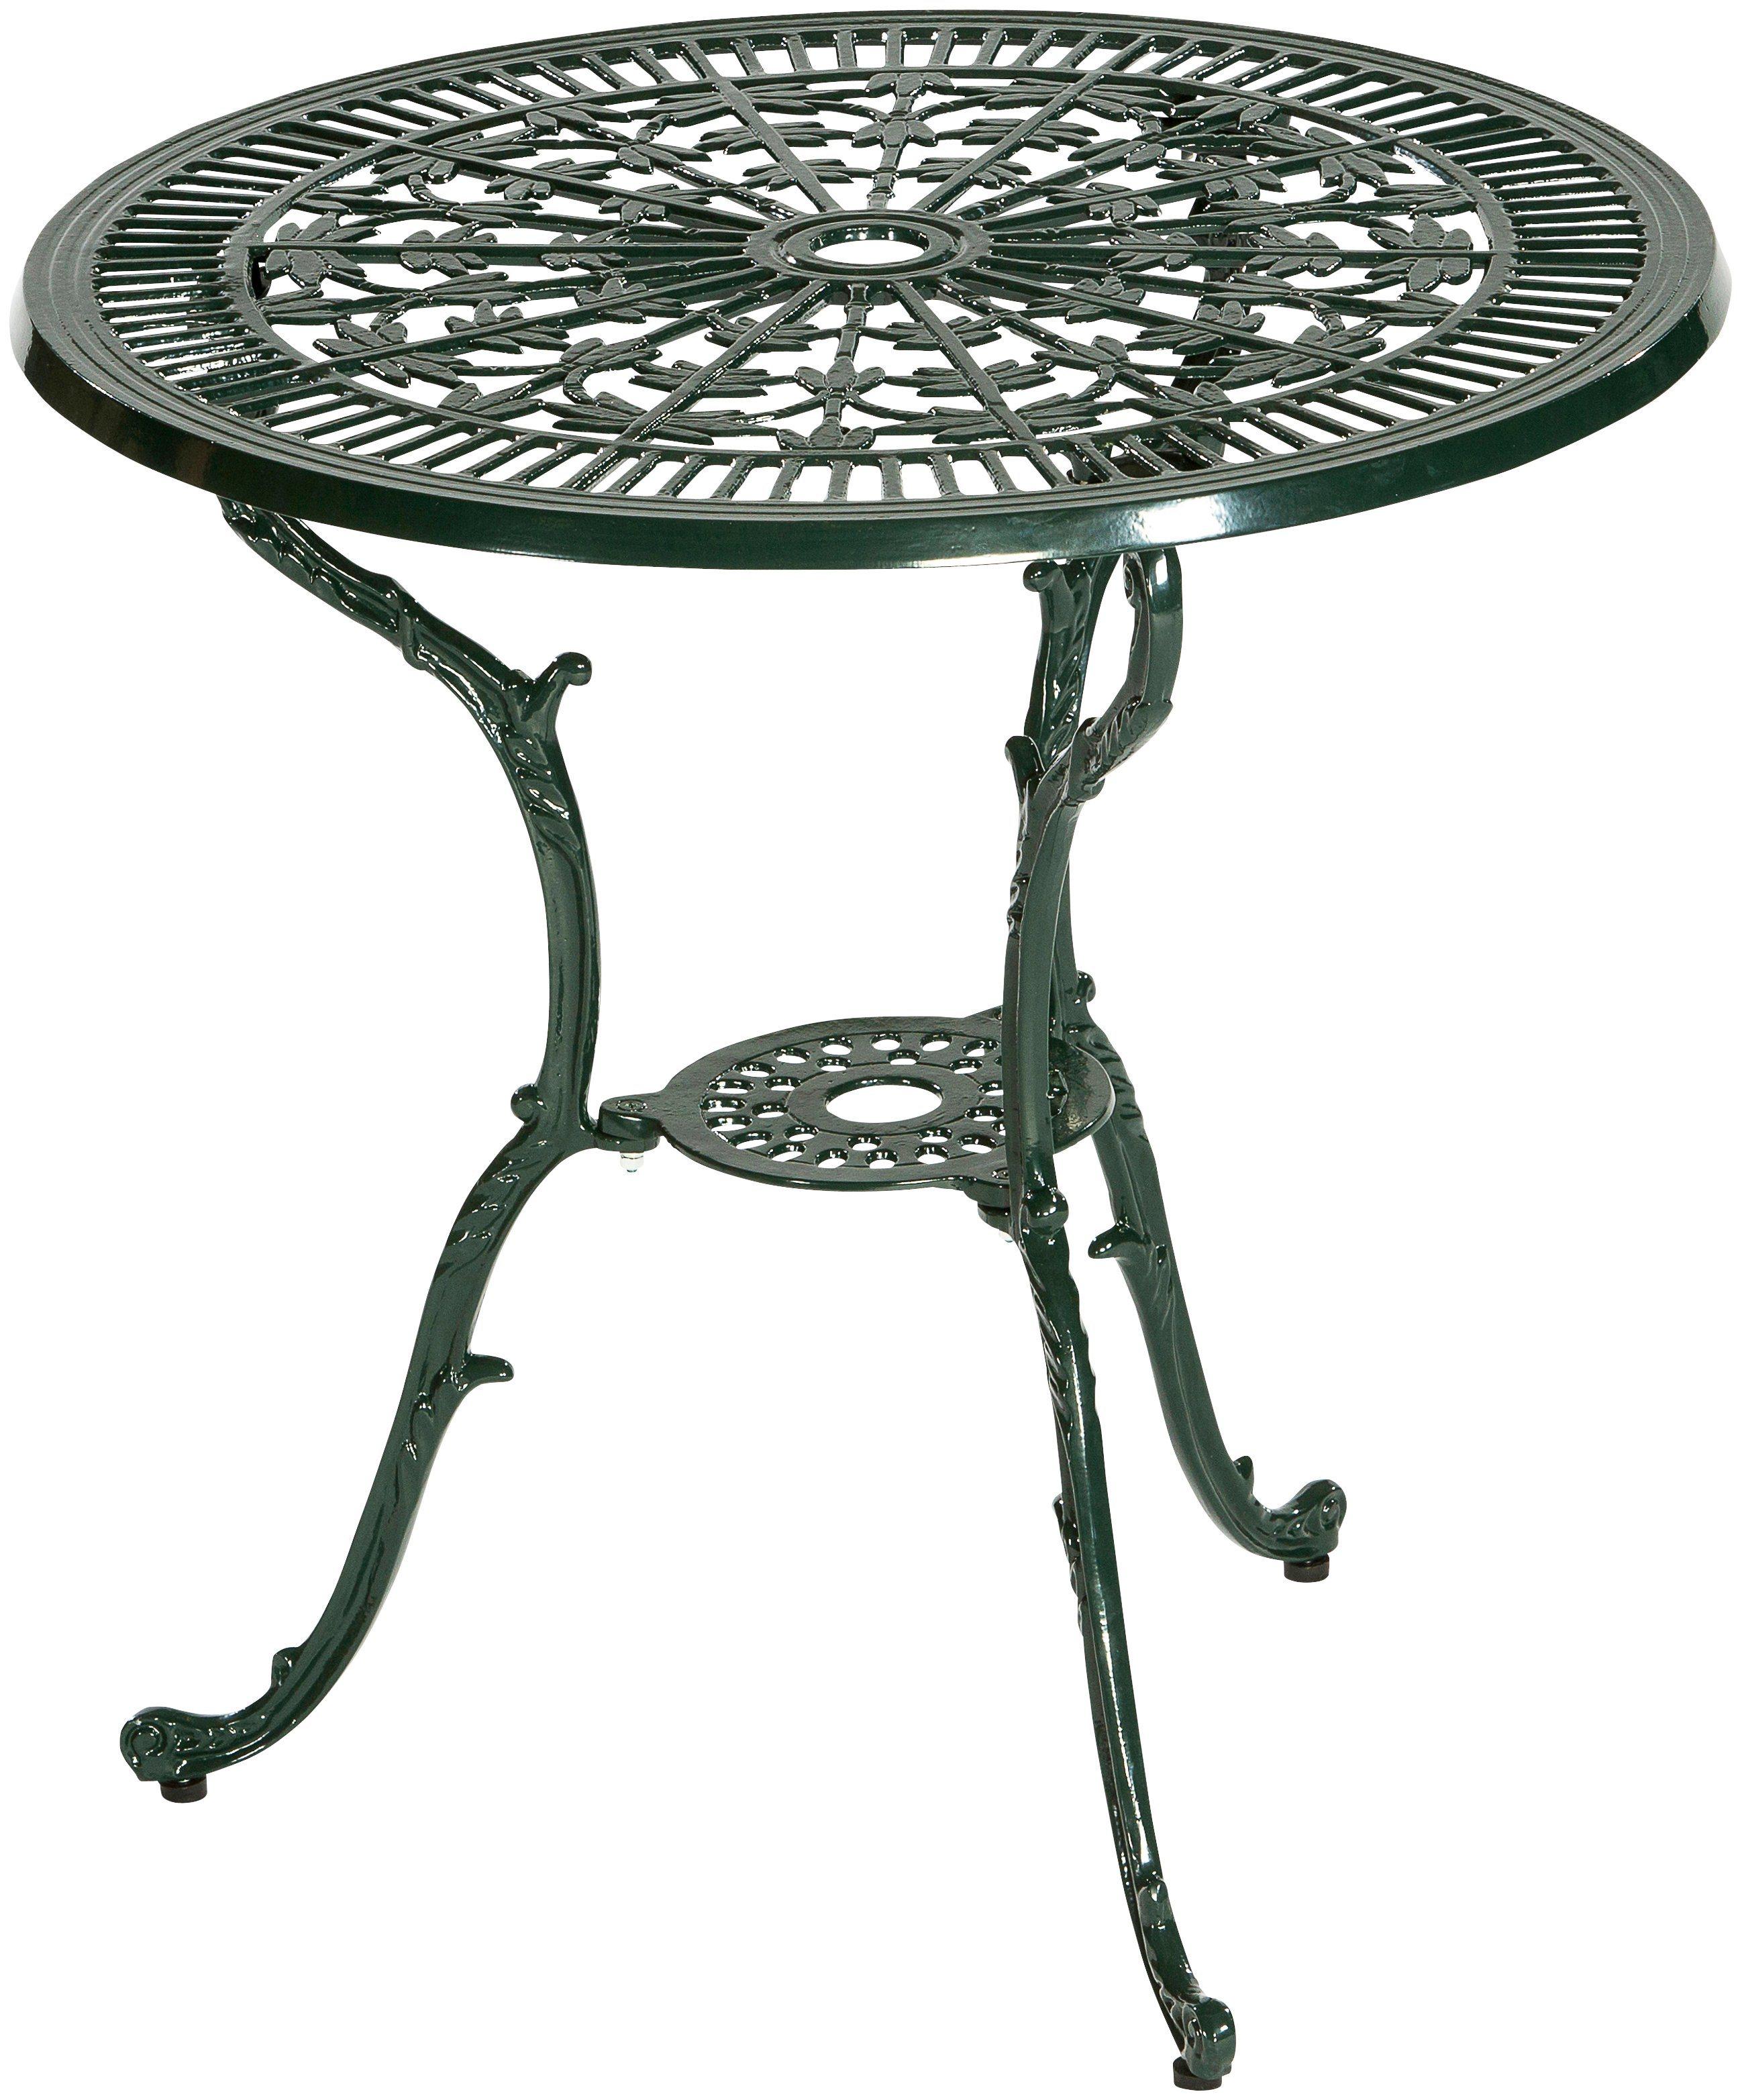 MERXX Gartentisch »Lugano«, Aluminium, Ø 70 cm, grün   Garten > Gartenmöbel > Gartentische   MERXX